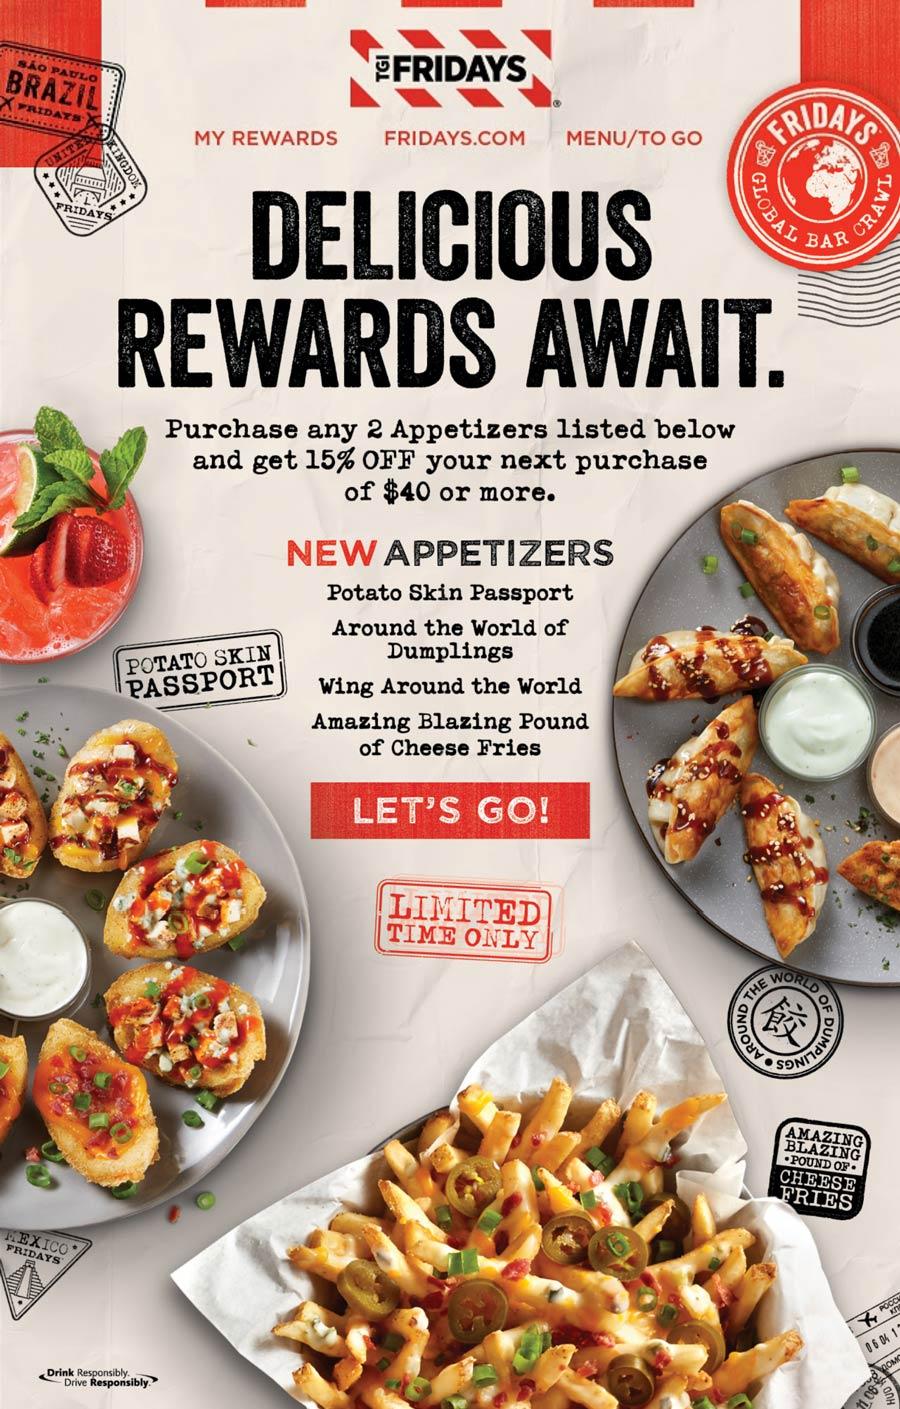 TGI Fridays restaurants Coupon  15% off $40 with 2 appetizer purchase at TGI Fridays #tgifridays